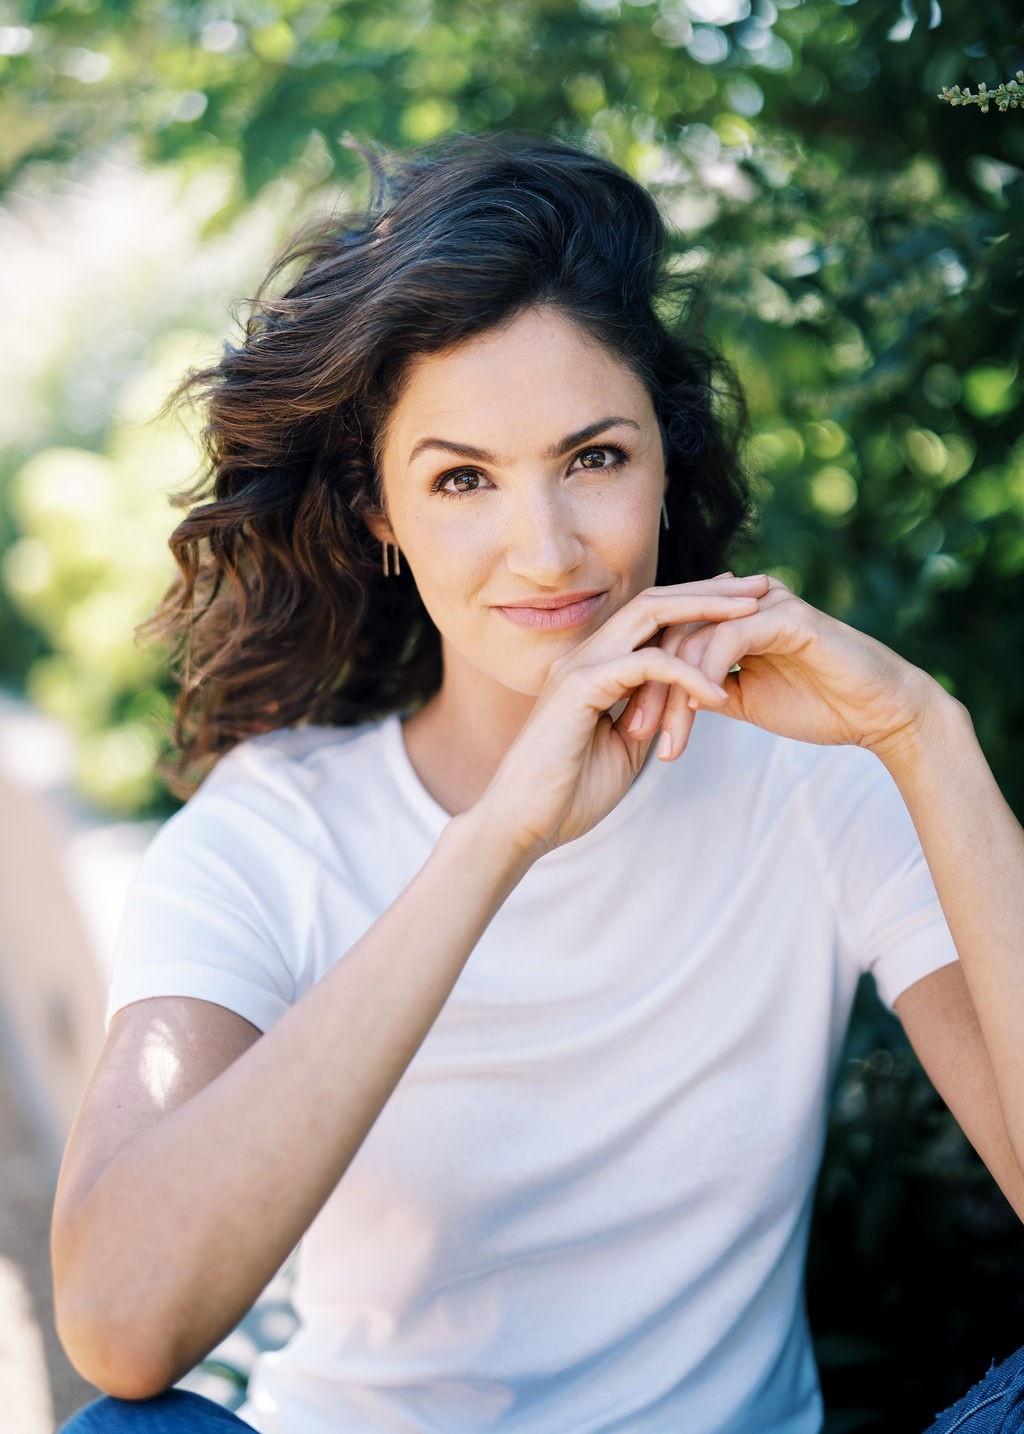 joanne-wetzel-life-coach-for-female-entrepreneurs-personal-development-growth-self-help-for-women